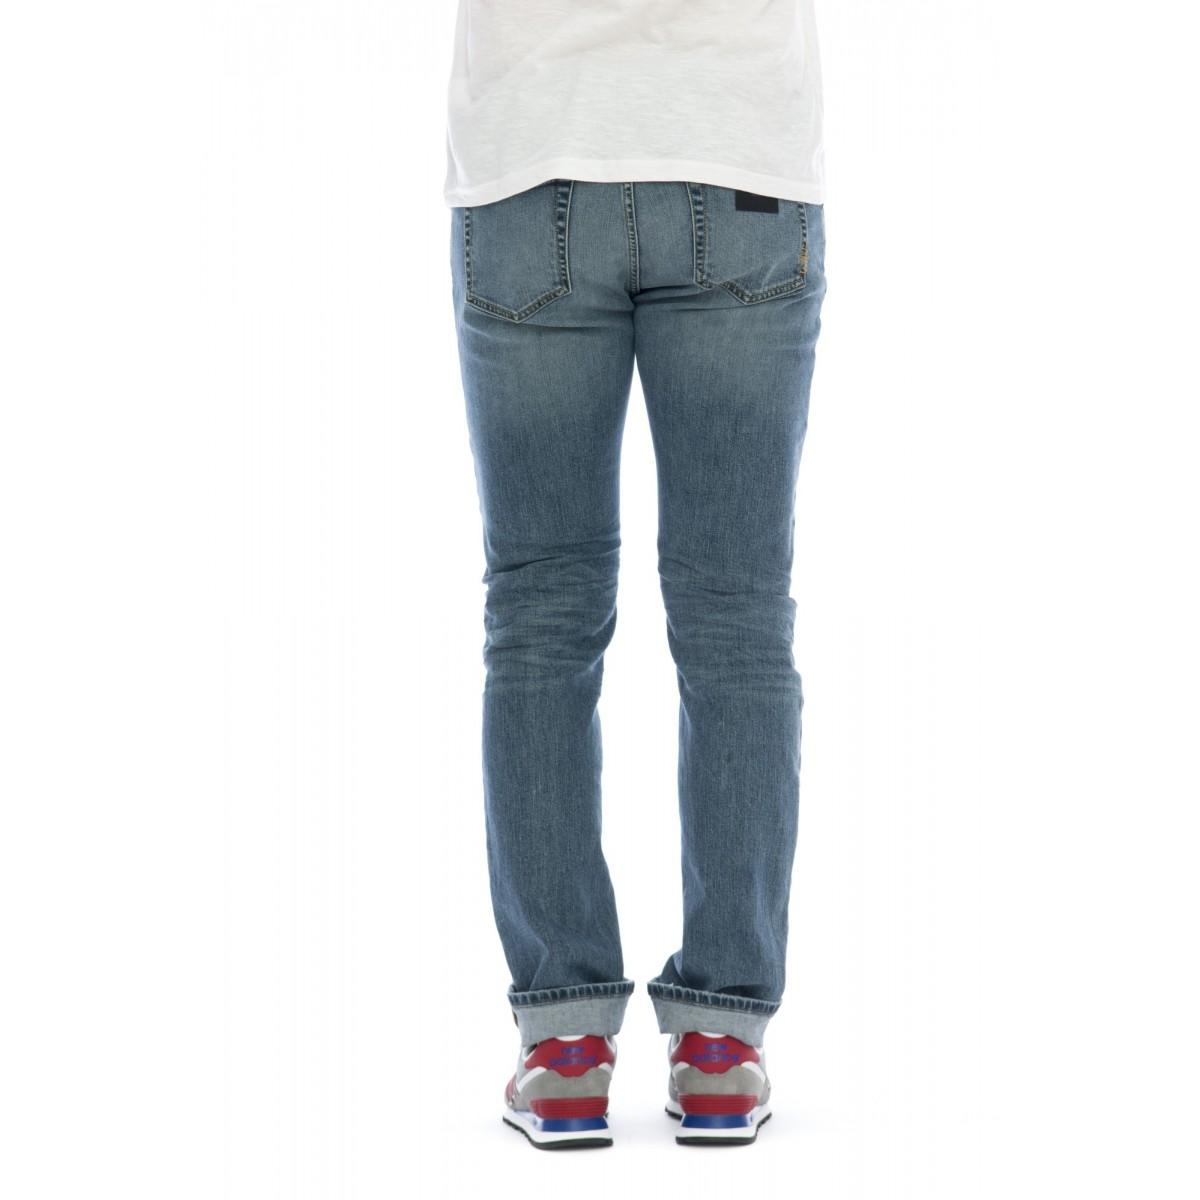 Jeans - C646l1 gp01 jeans slim strech